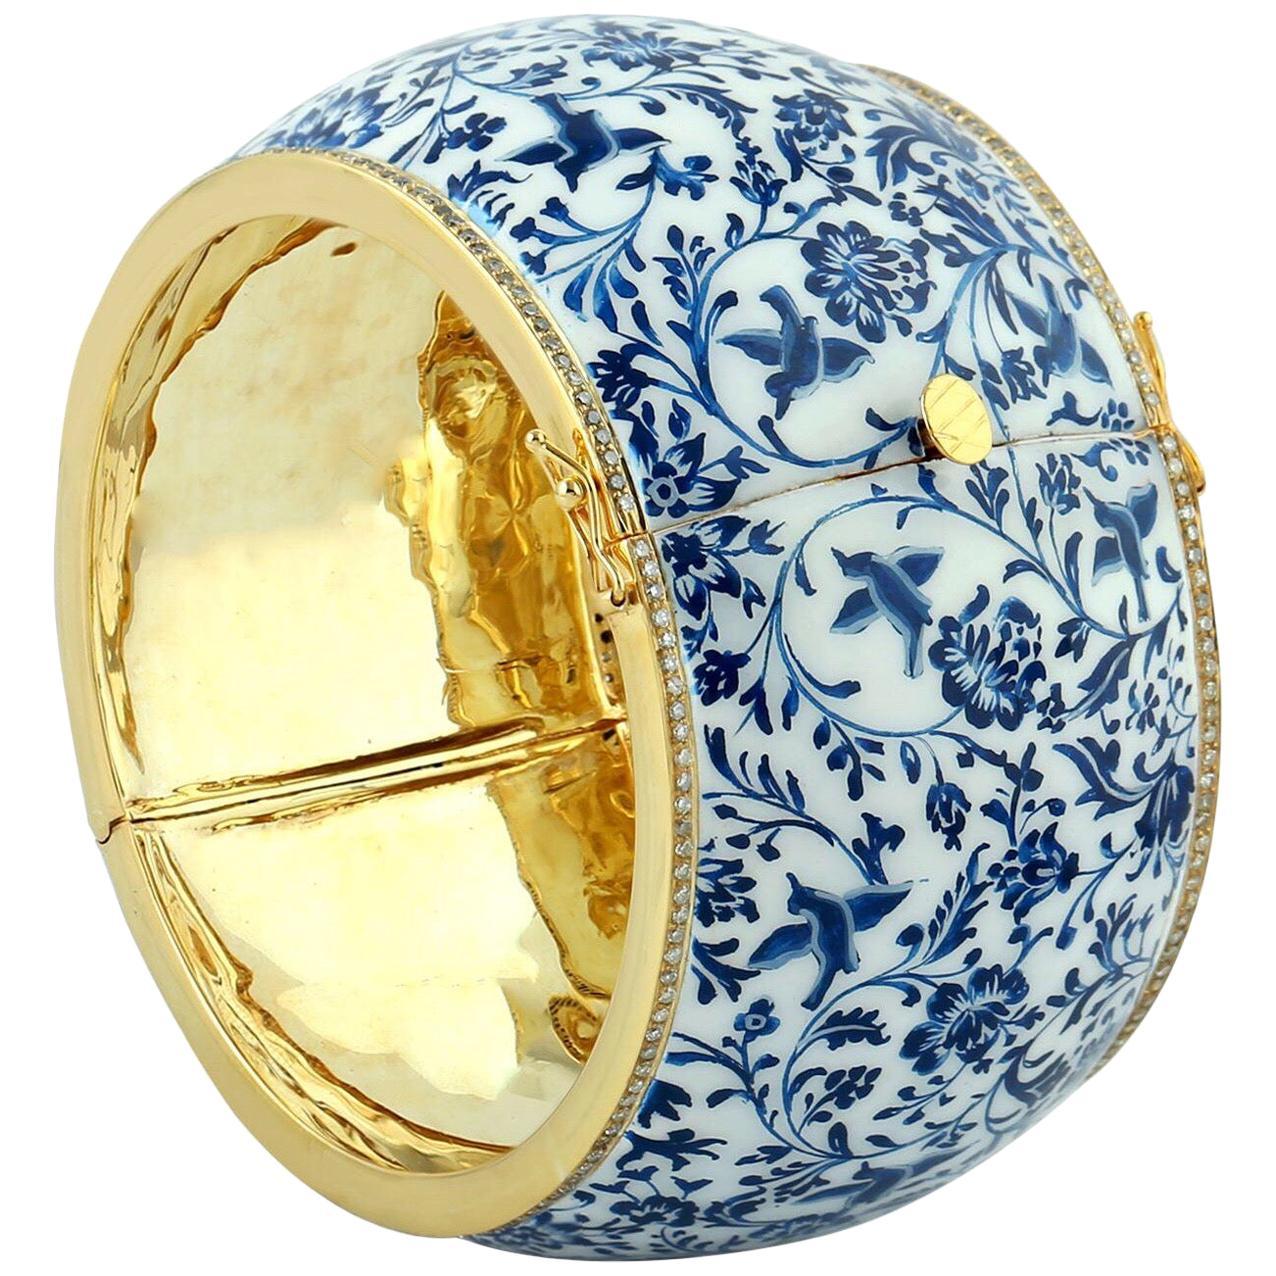 Enamel Turquoise Floral Diamond Bangle Bracelet